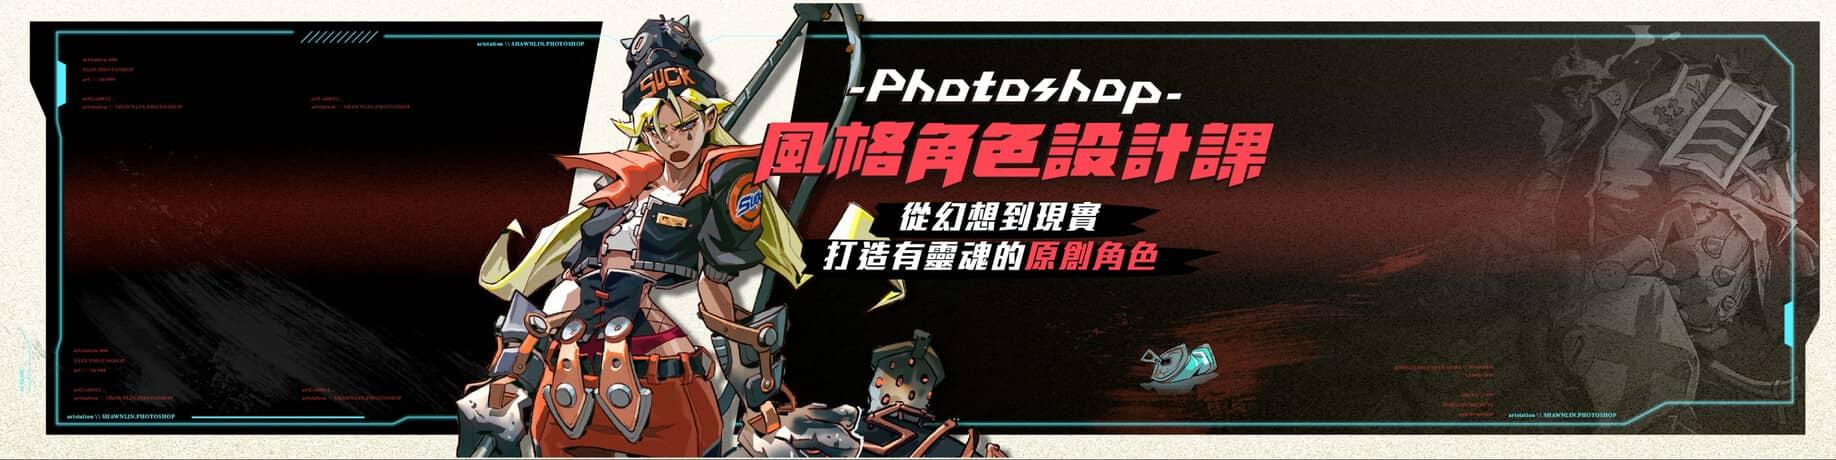 Photoshop 風格角色設計課 | 打造有靈魂的原創角色